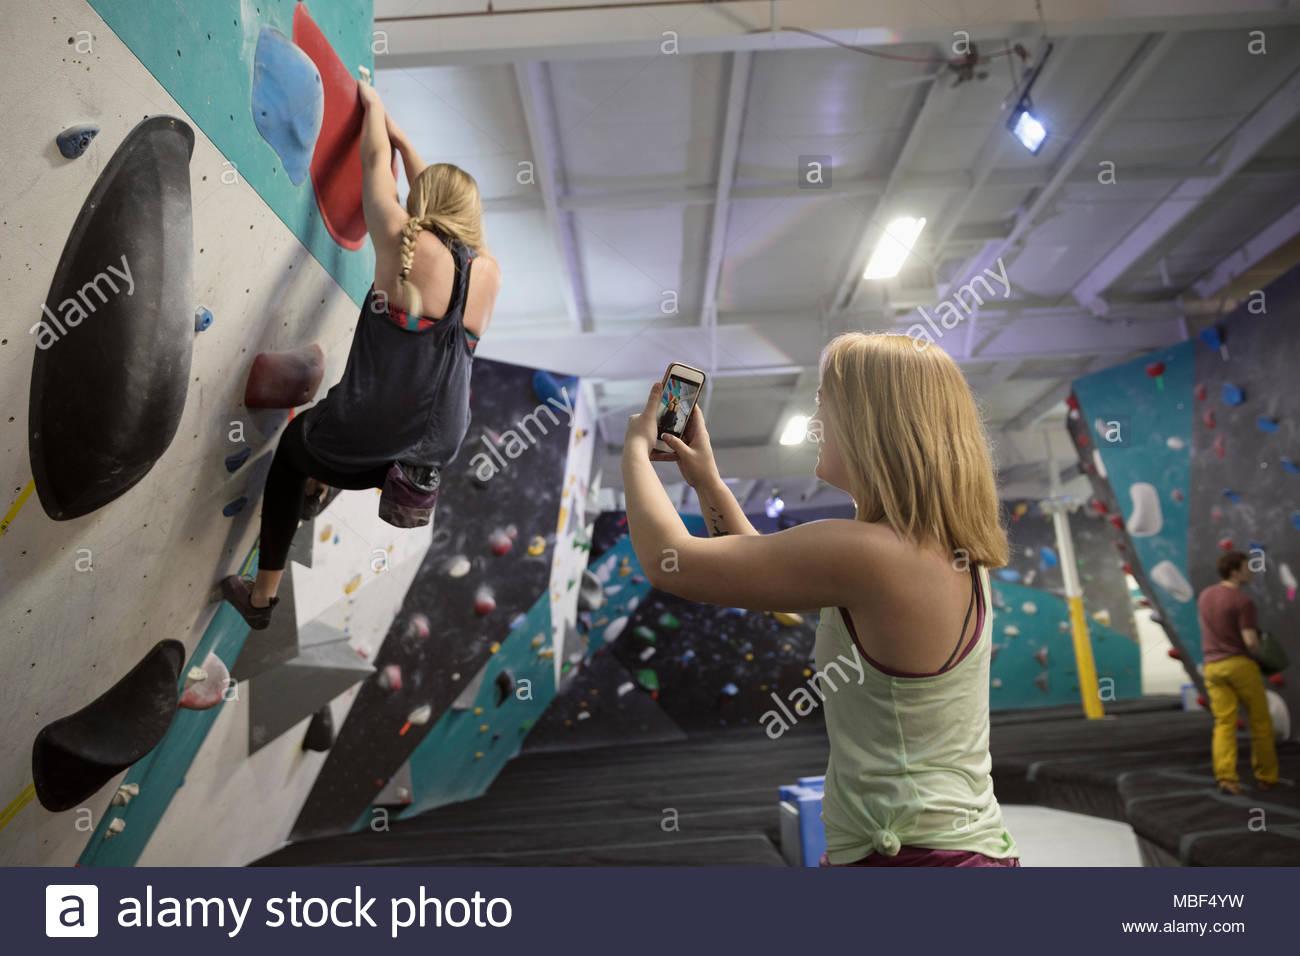 Weibliche Kletterer mit Kamera Handy videoing Partner kletterwand an der Kletterhalle Stockbild